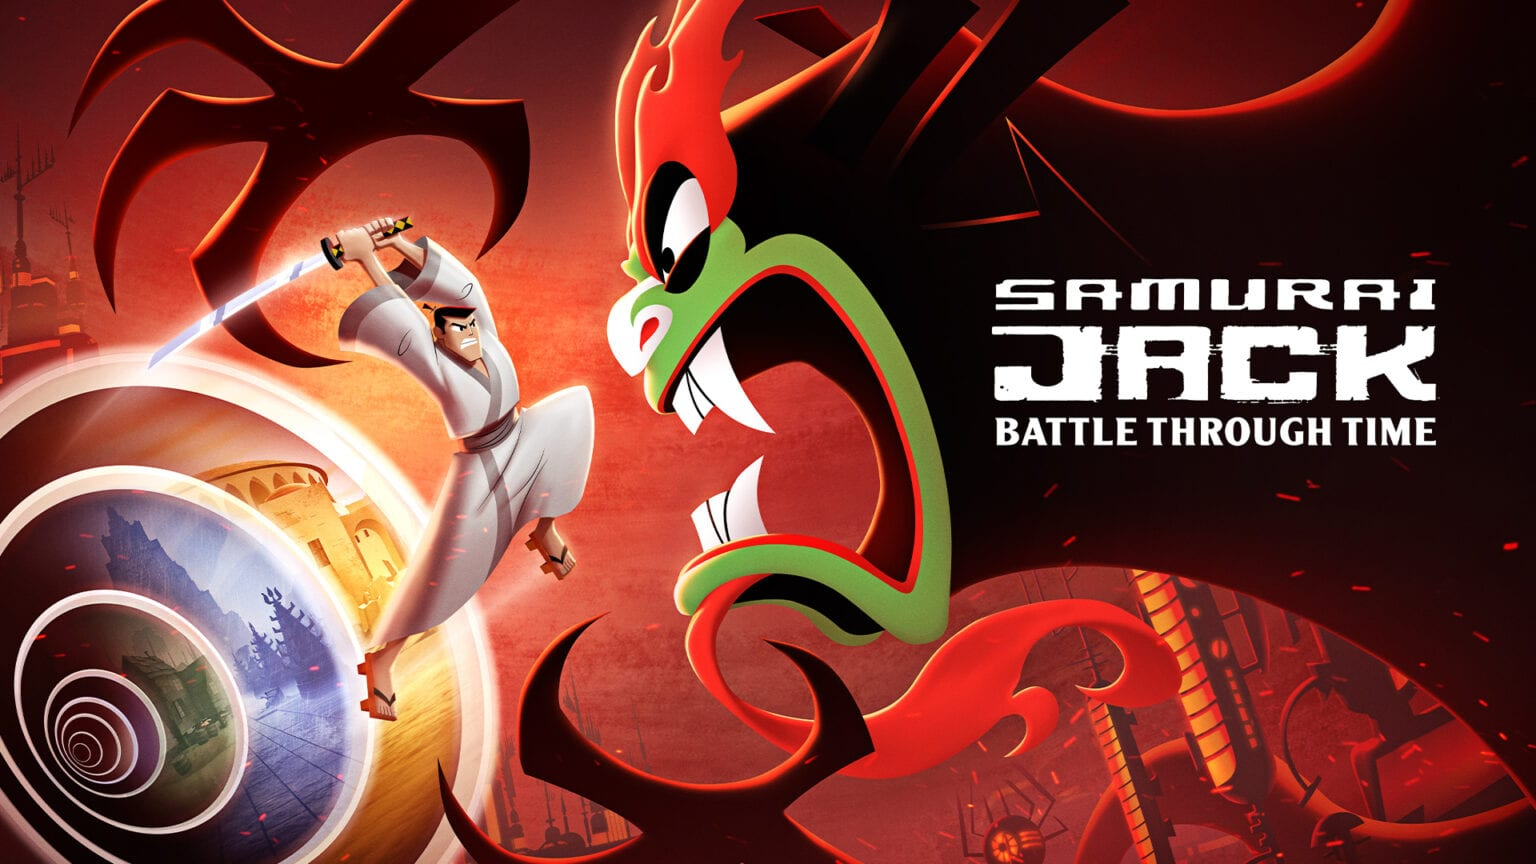 'Samurai Jack: Battle Through Time' will launch on Apple Arcade soon